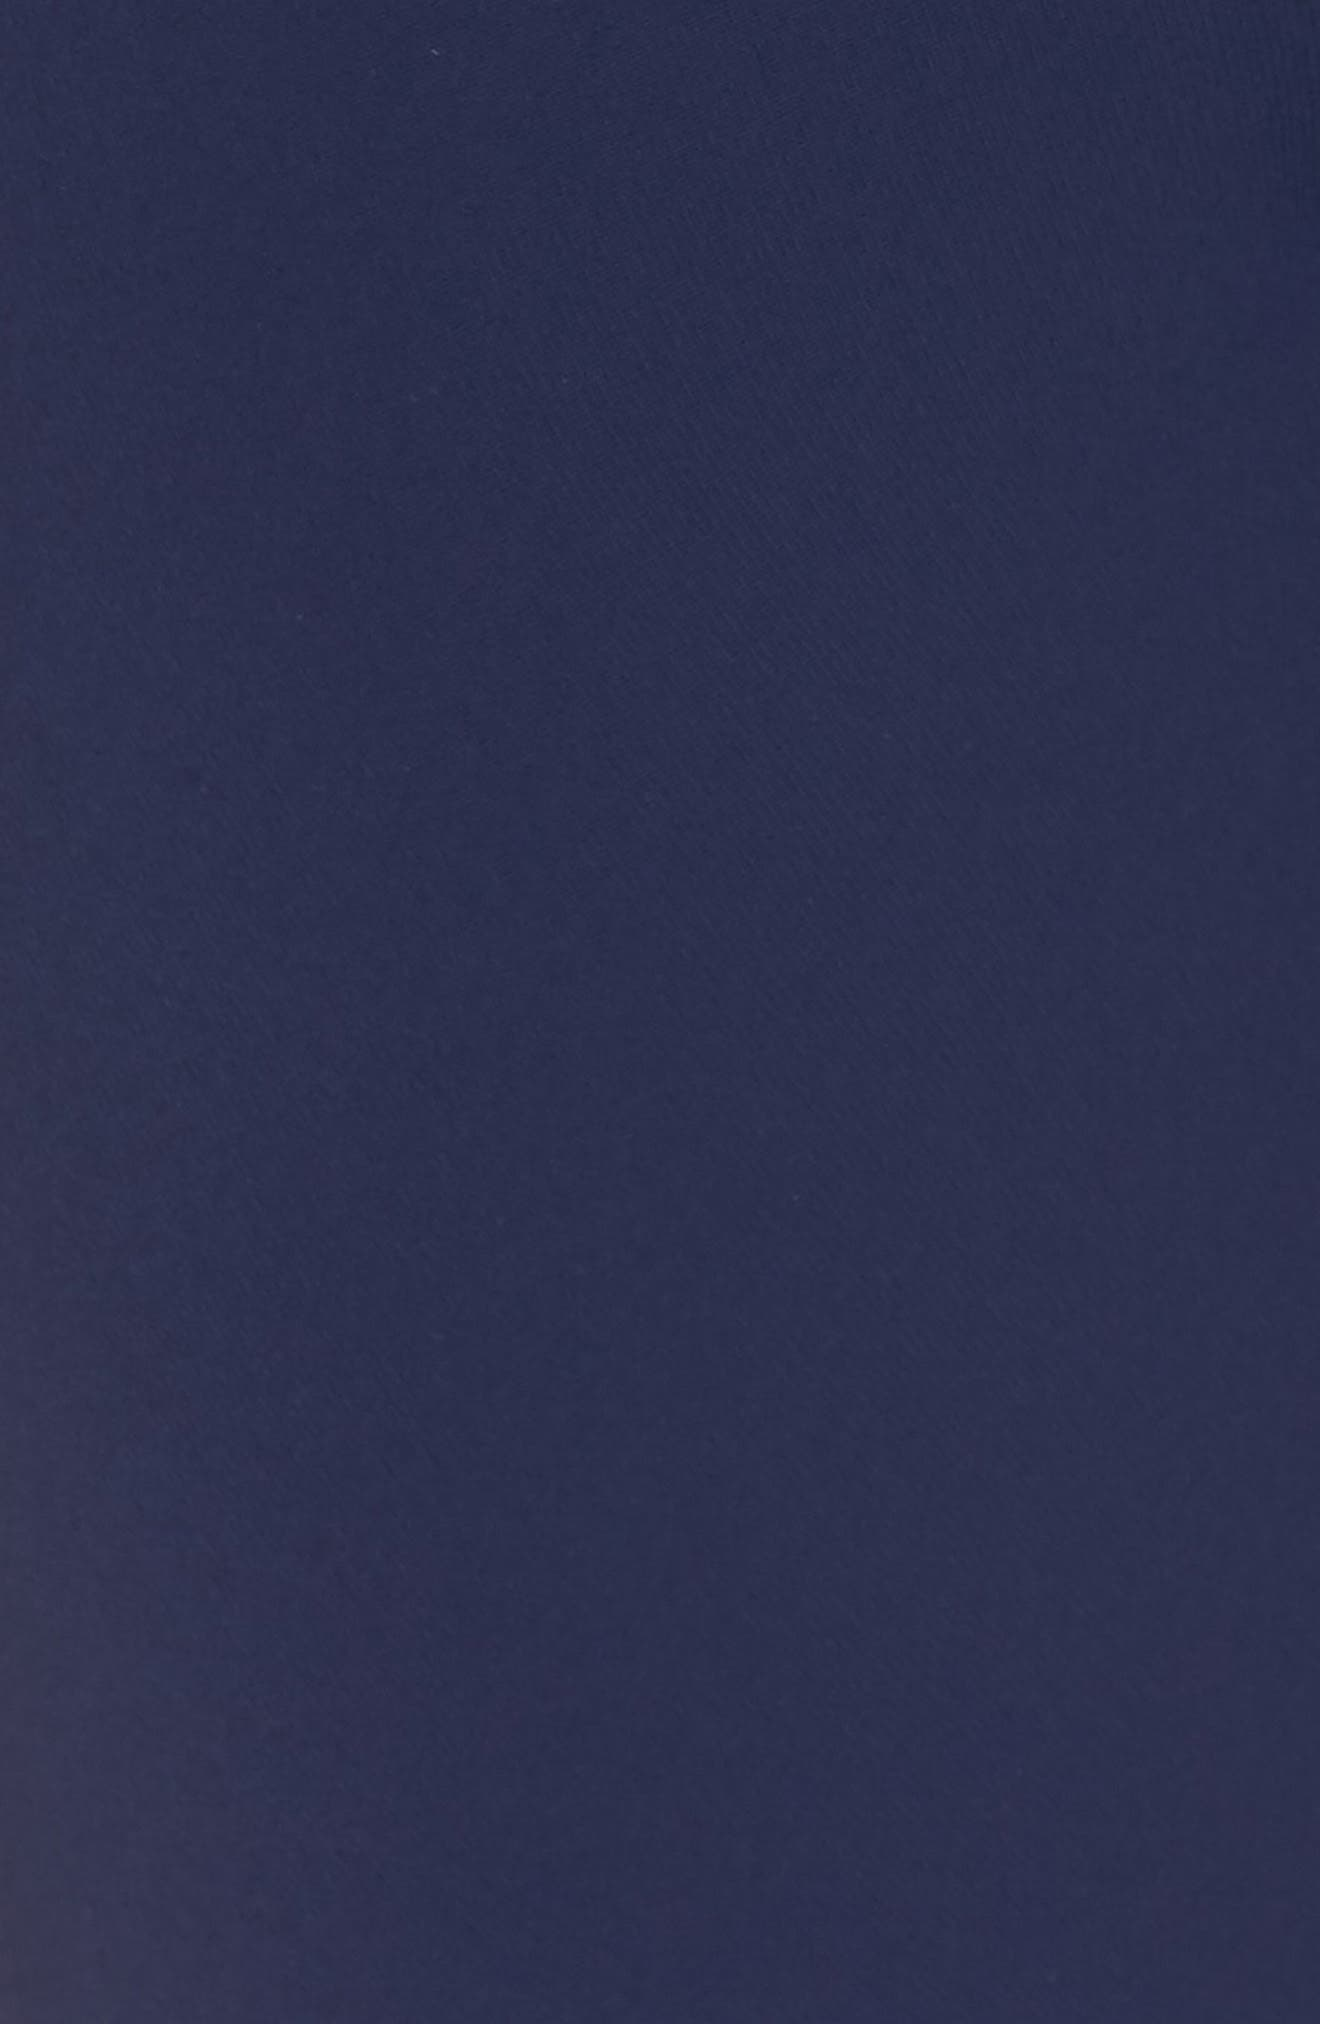 MICHAEL MICHAEL KORS, Belted Ruffle Jumpsuit, Alternate thumbnail 6, color, 400